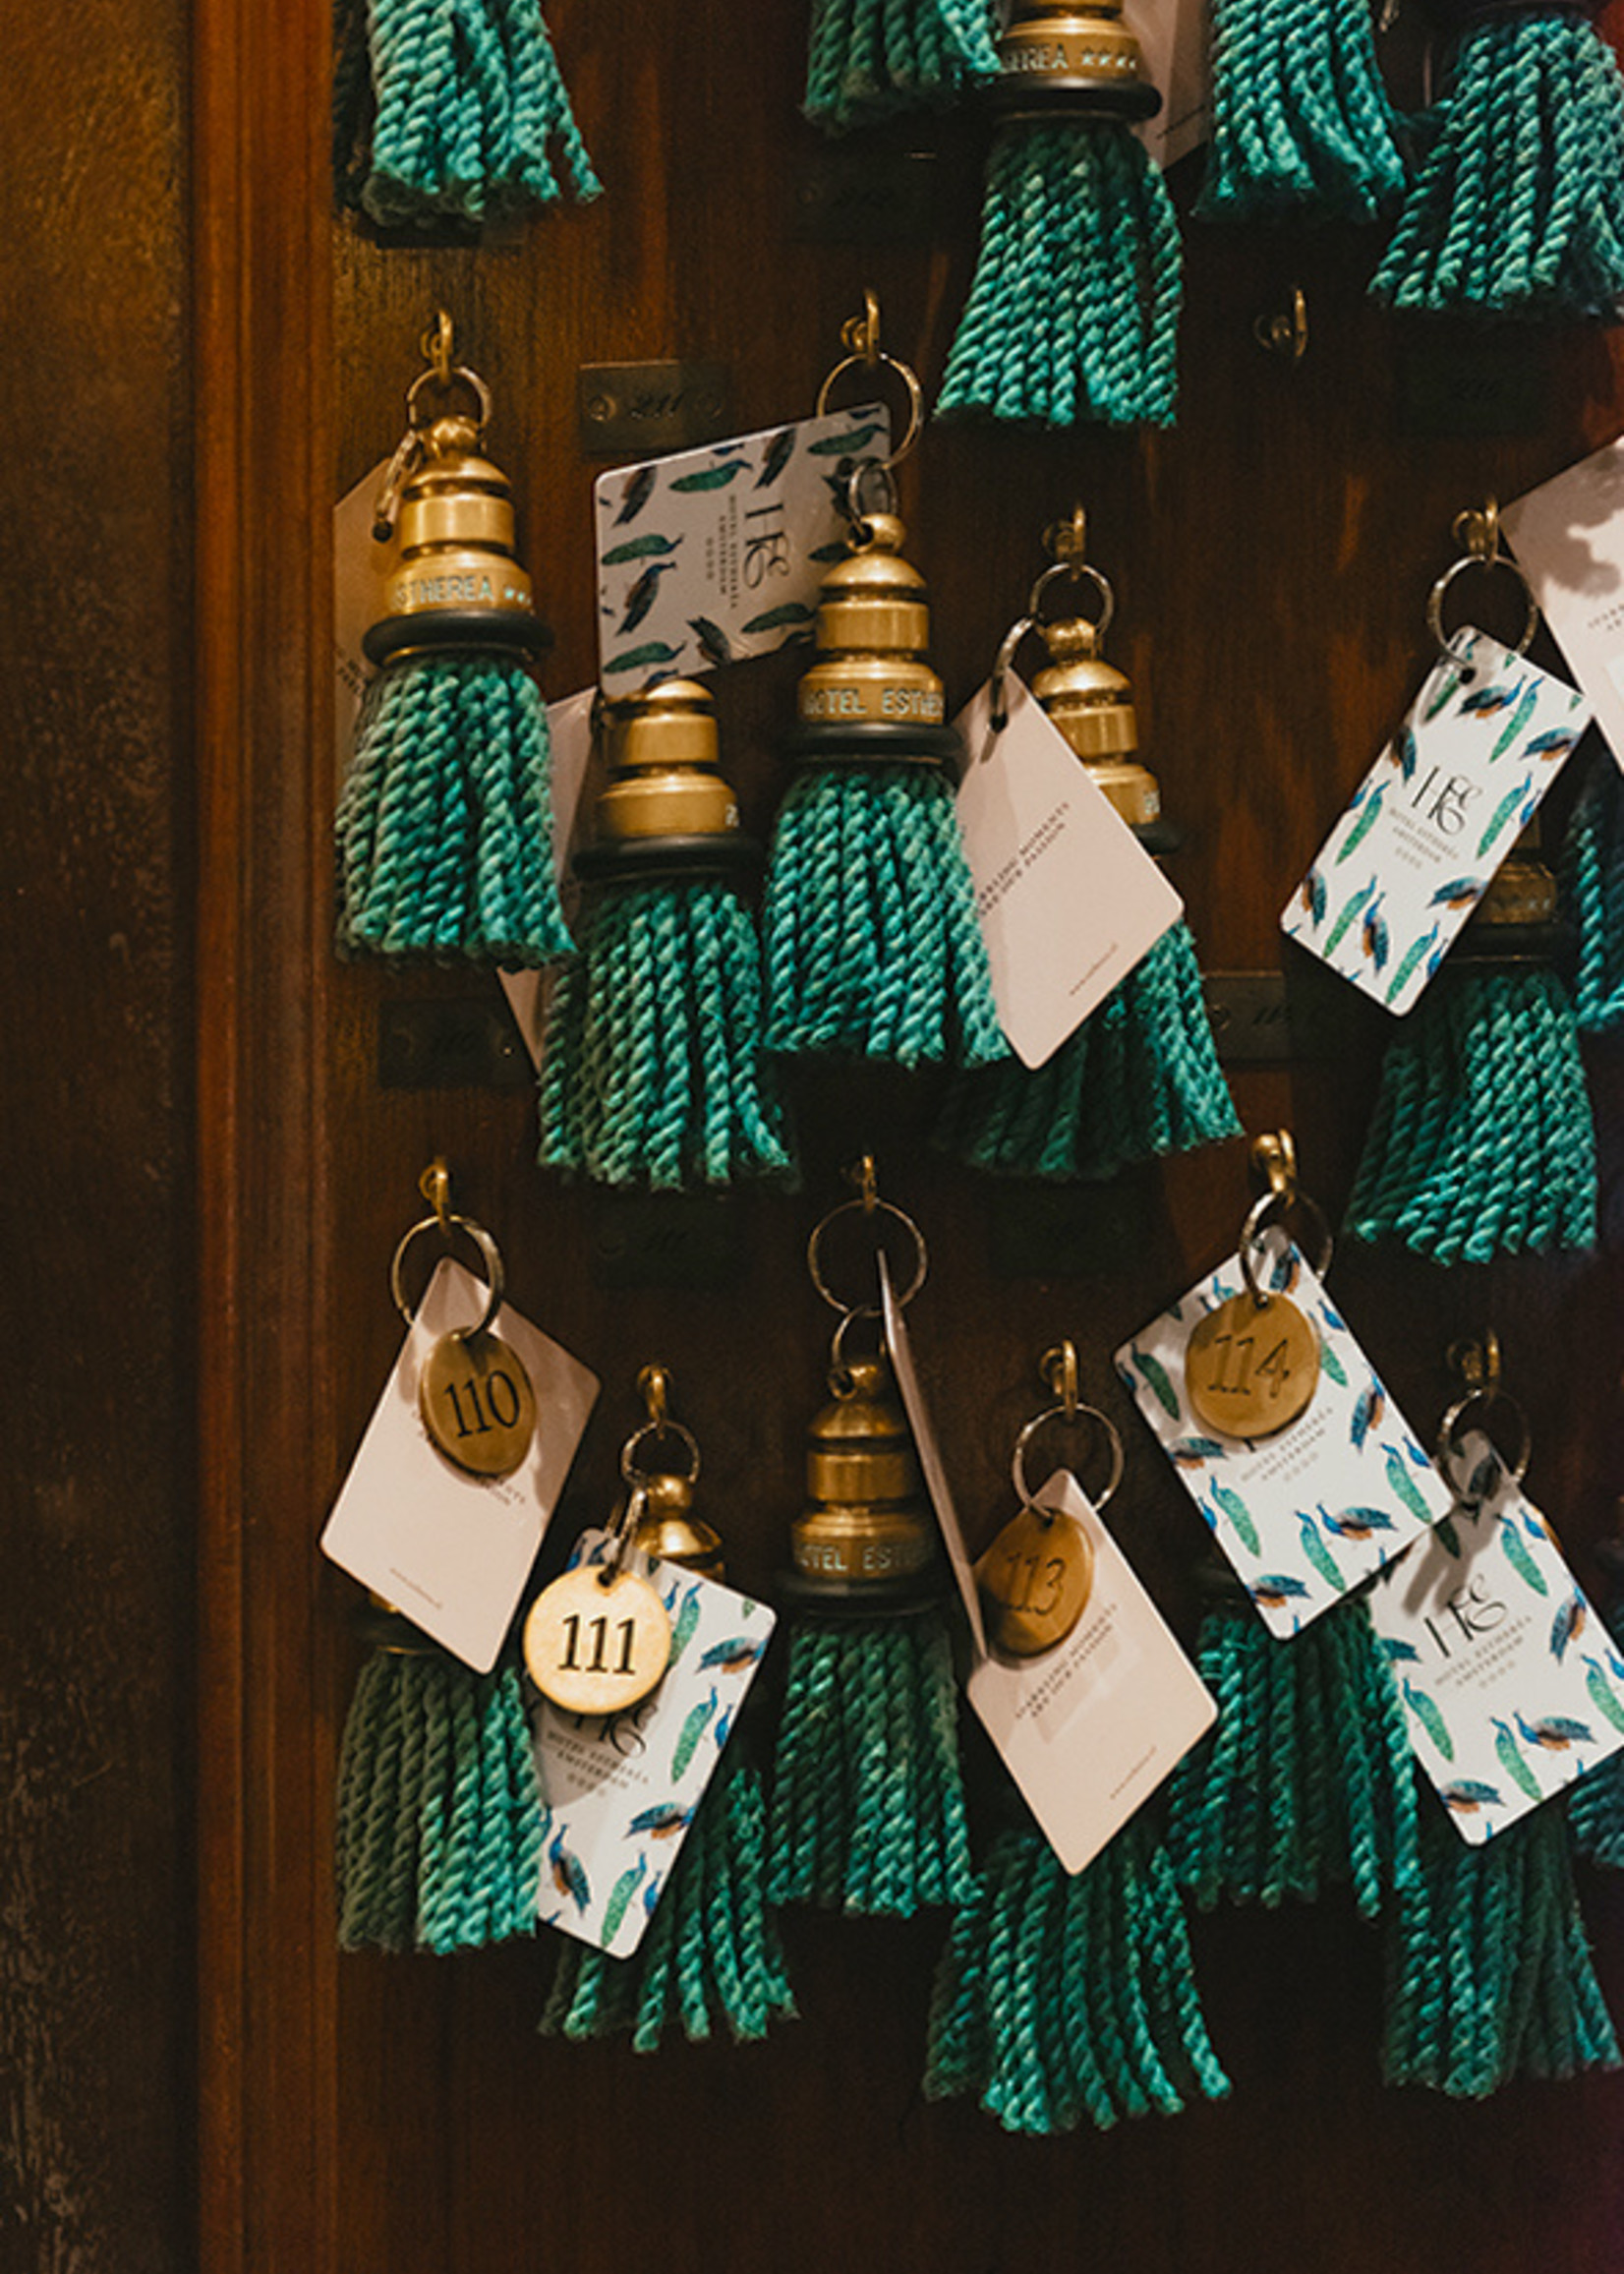 Esther's Hotel Estheréa custom keychain with blue fringe